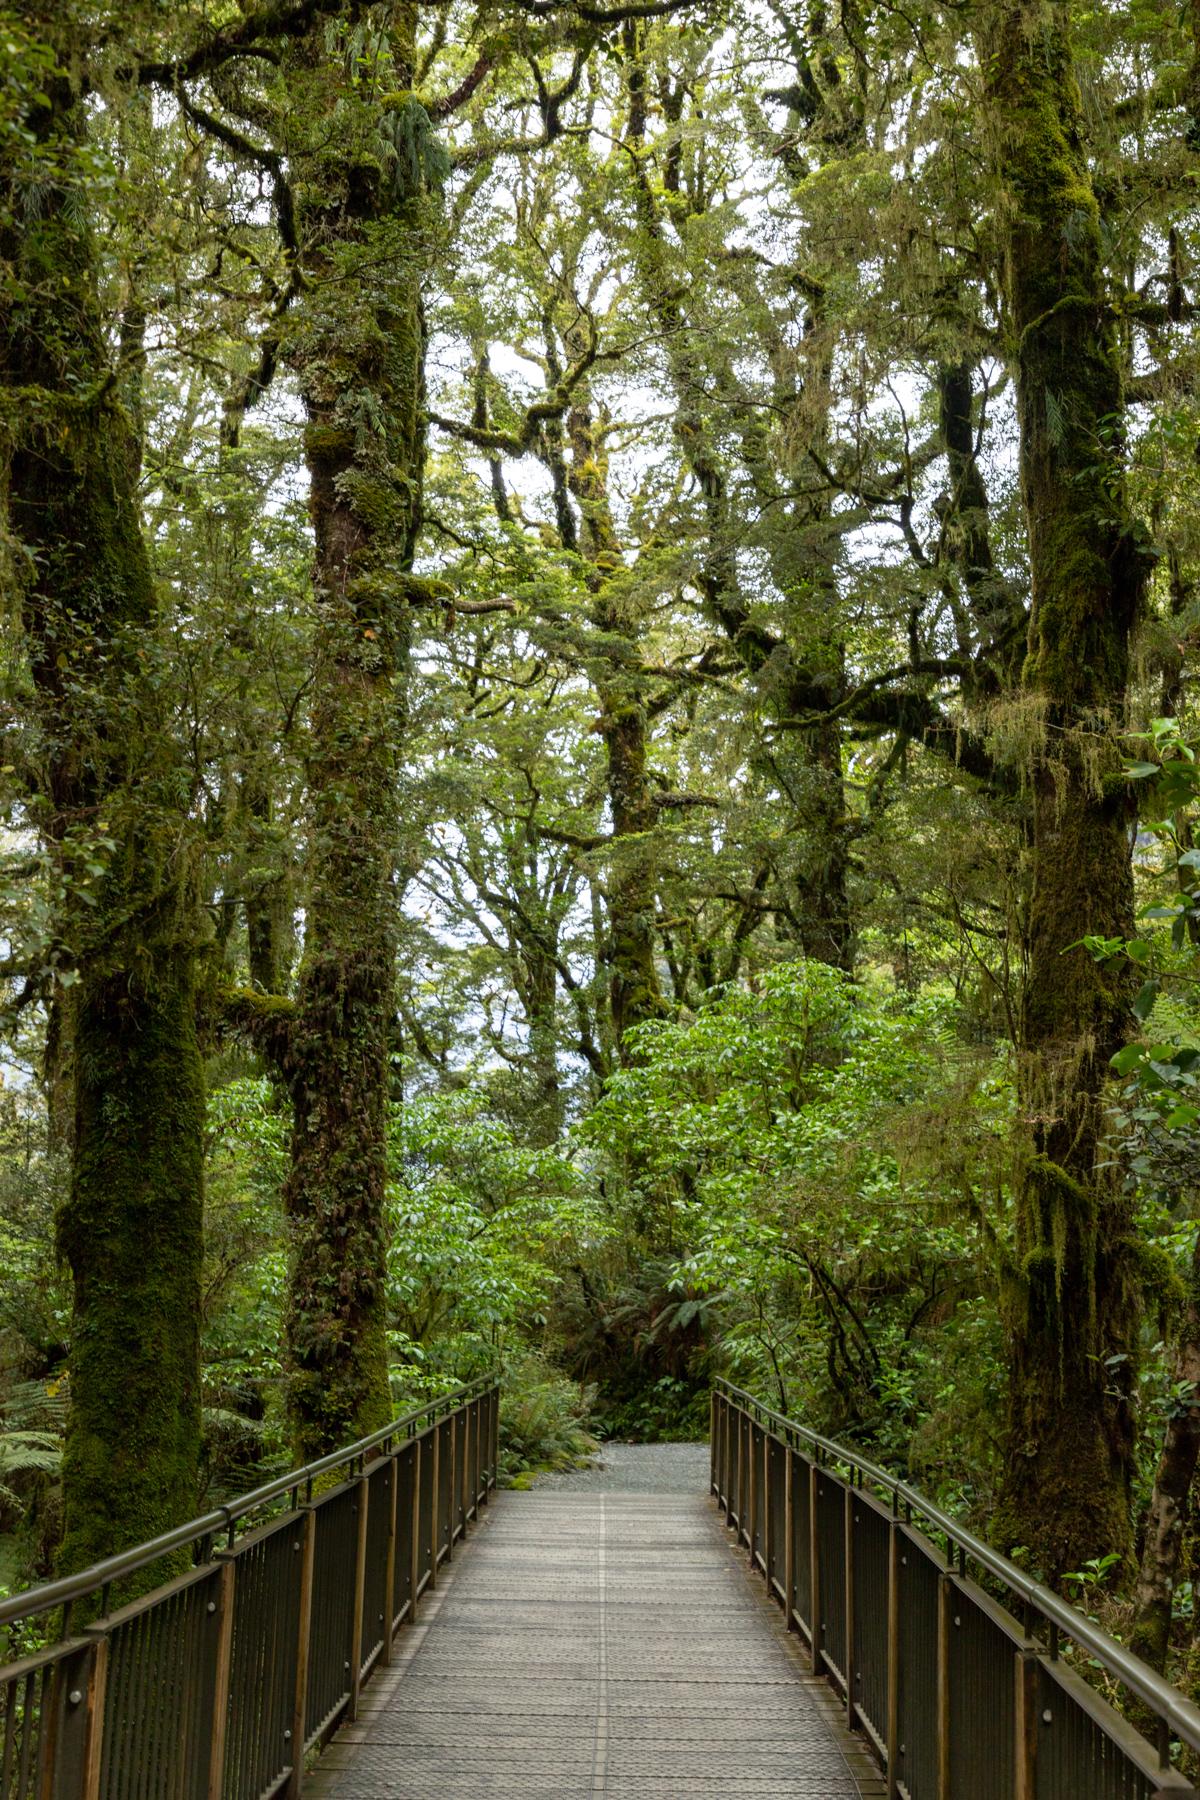 img 9794 lr The Chasm (Milford Sound)